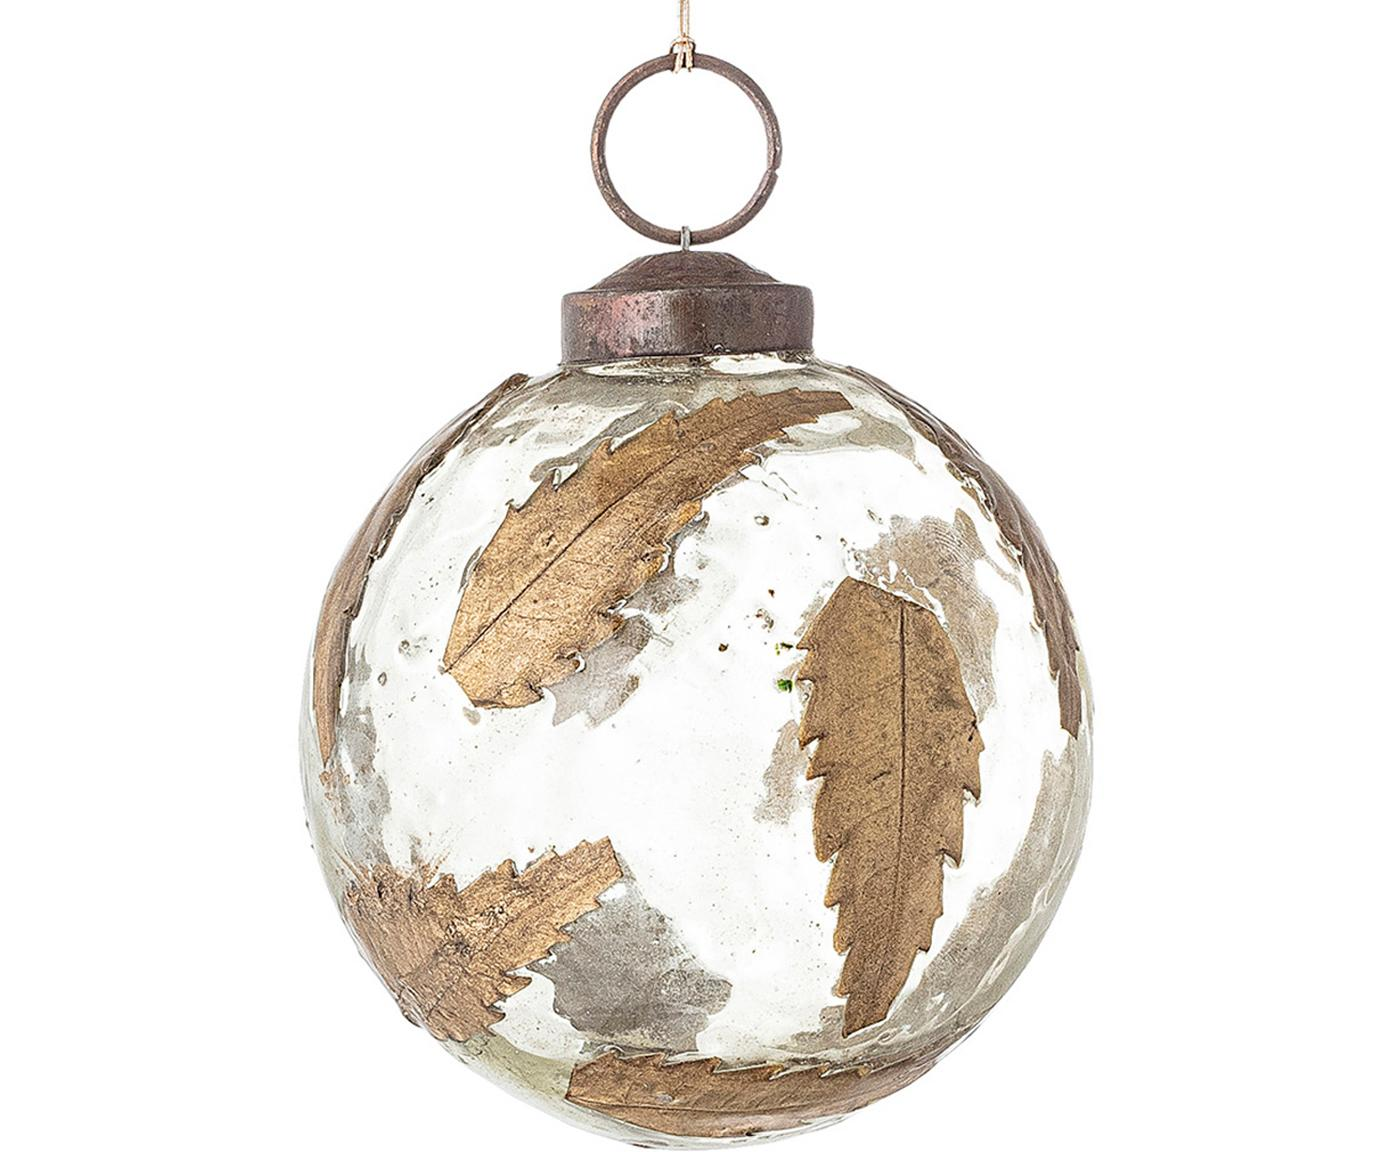 Weihnachtskugel Brask Ø7cm, Glas, Metall, Transparent, Messingfarben, Ø 7 cm